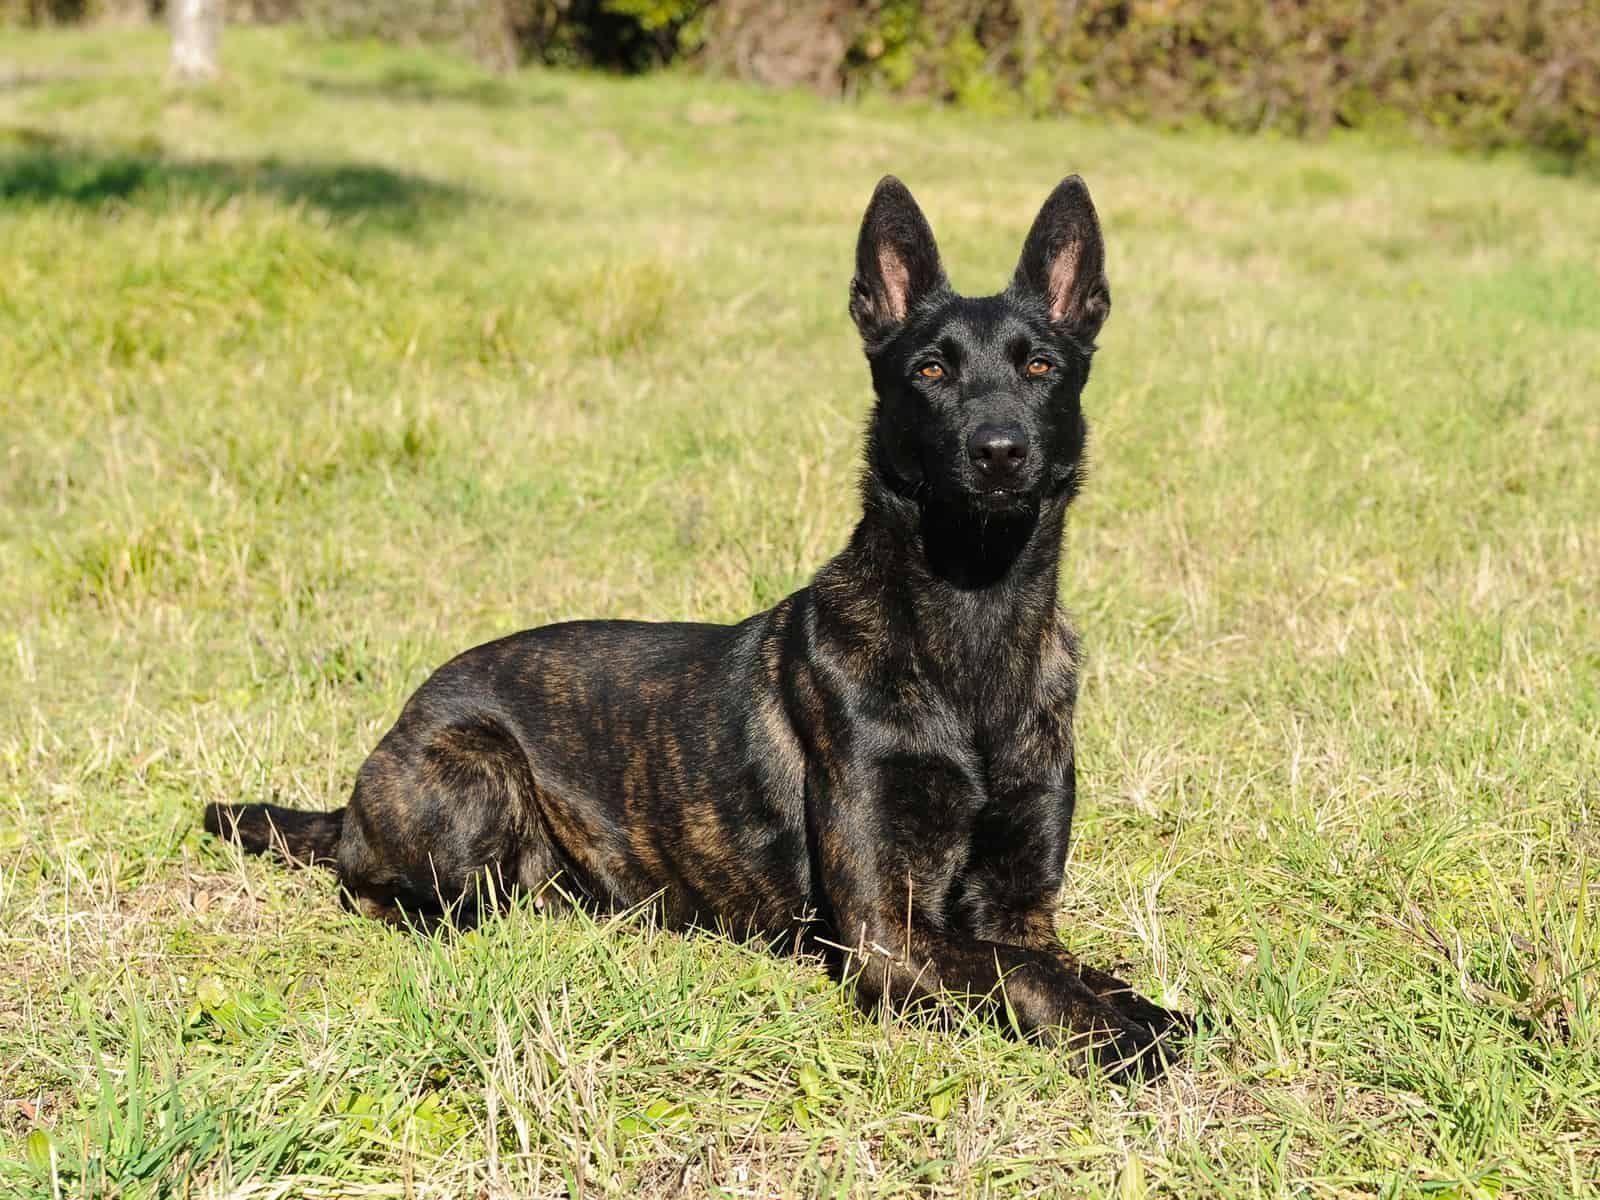 Portrait Of Dutch Shepherd Dog In Outdoors Dutch Shepherd Dog